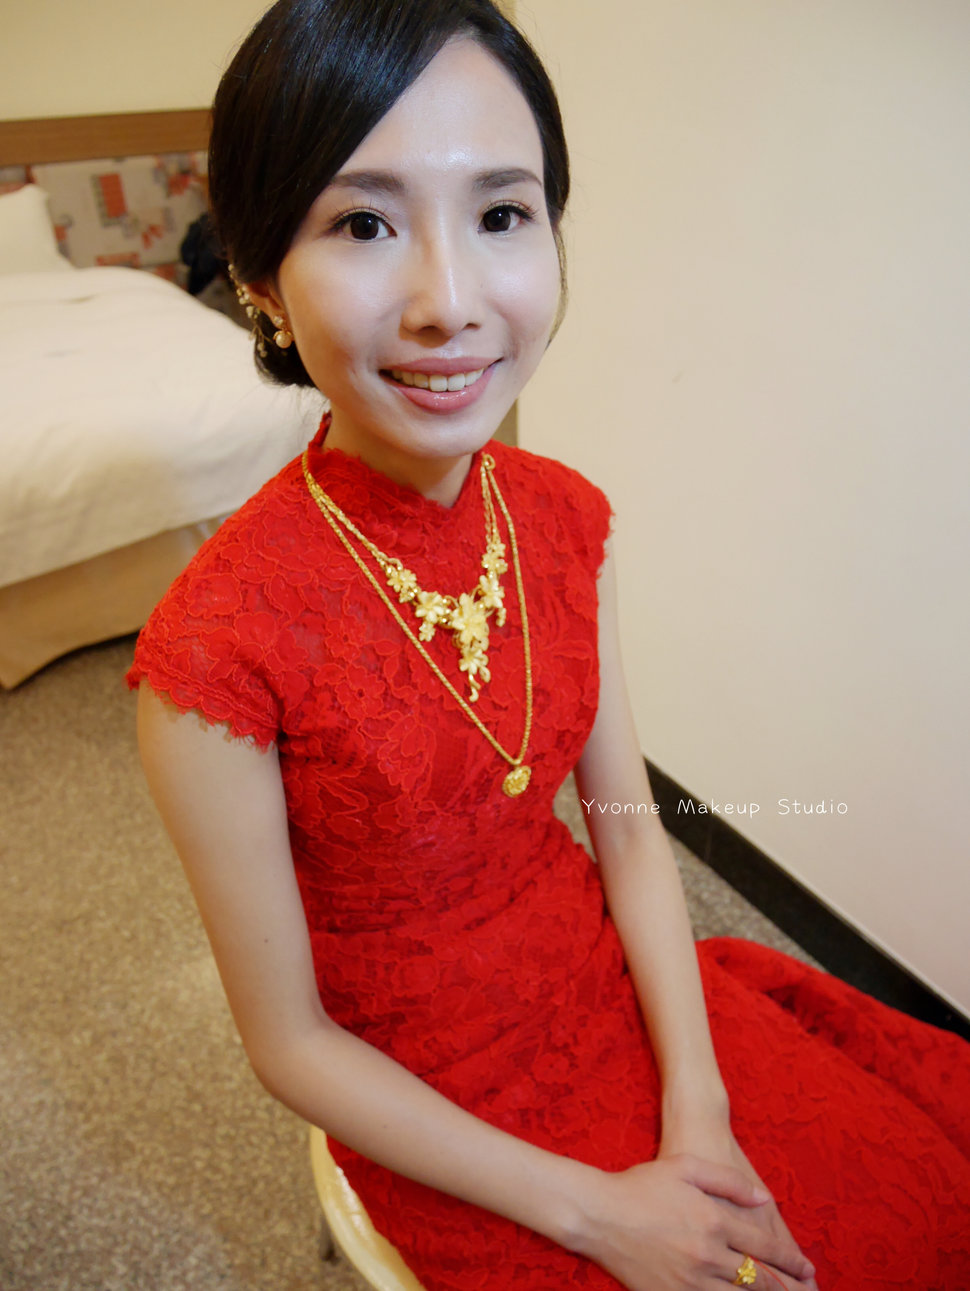 IMG_8438 - 做懂妳的新秘 Yvonne 嘉云《結婚吧》